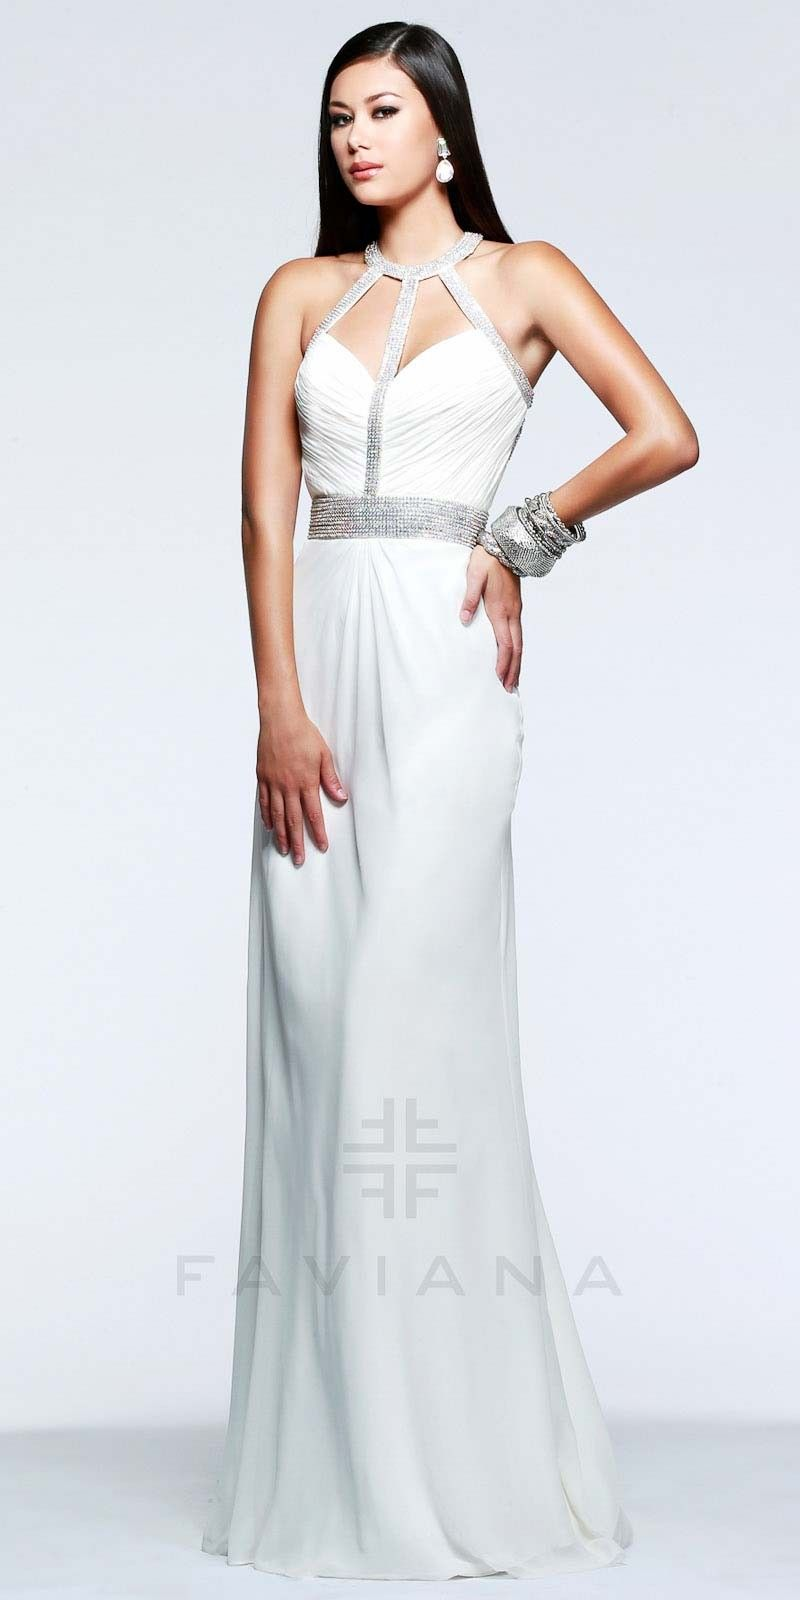 Grecian t strap prom dresses by faviana white dress pinterest